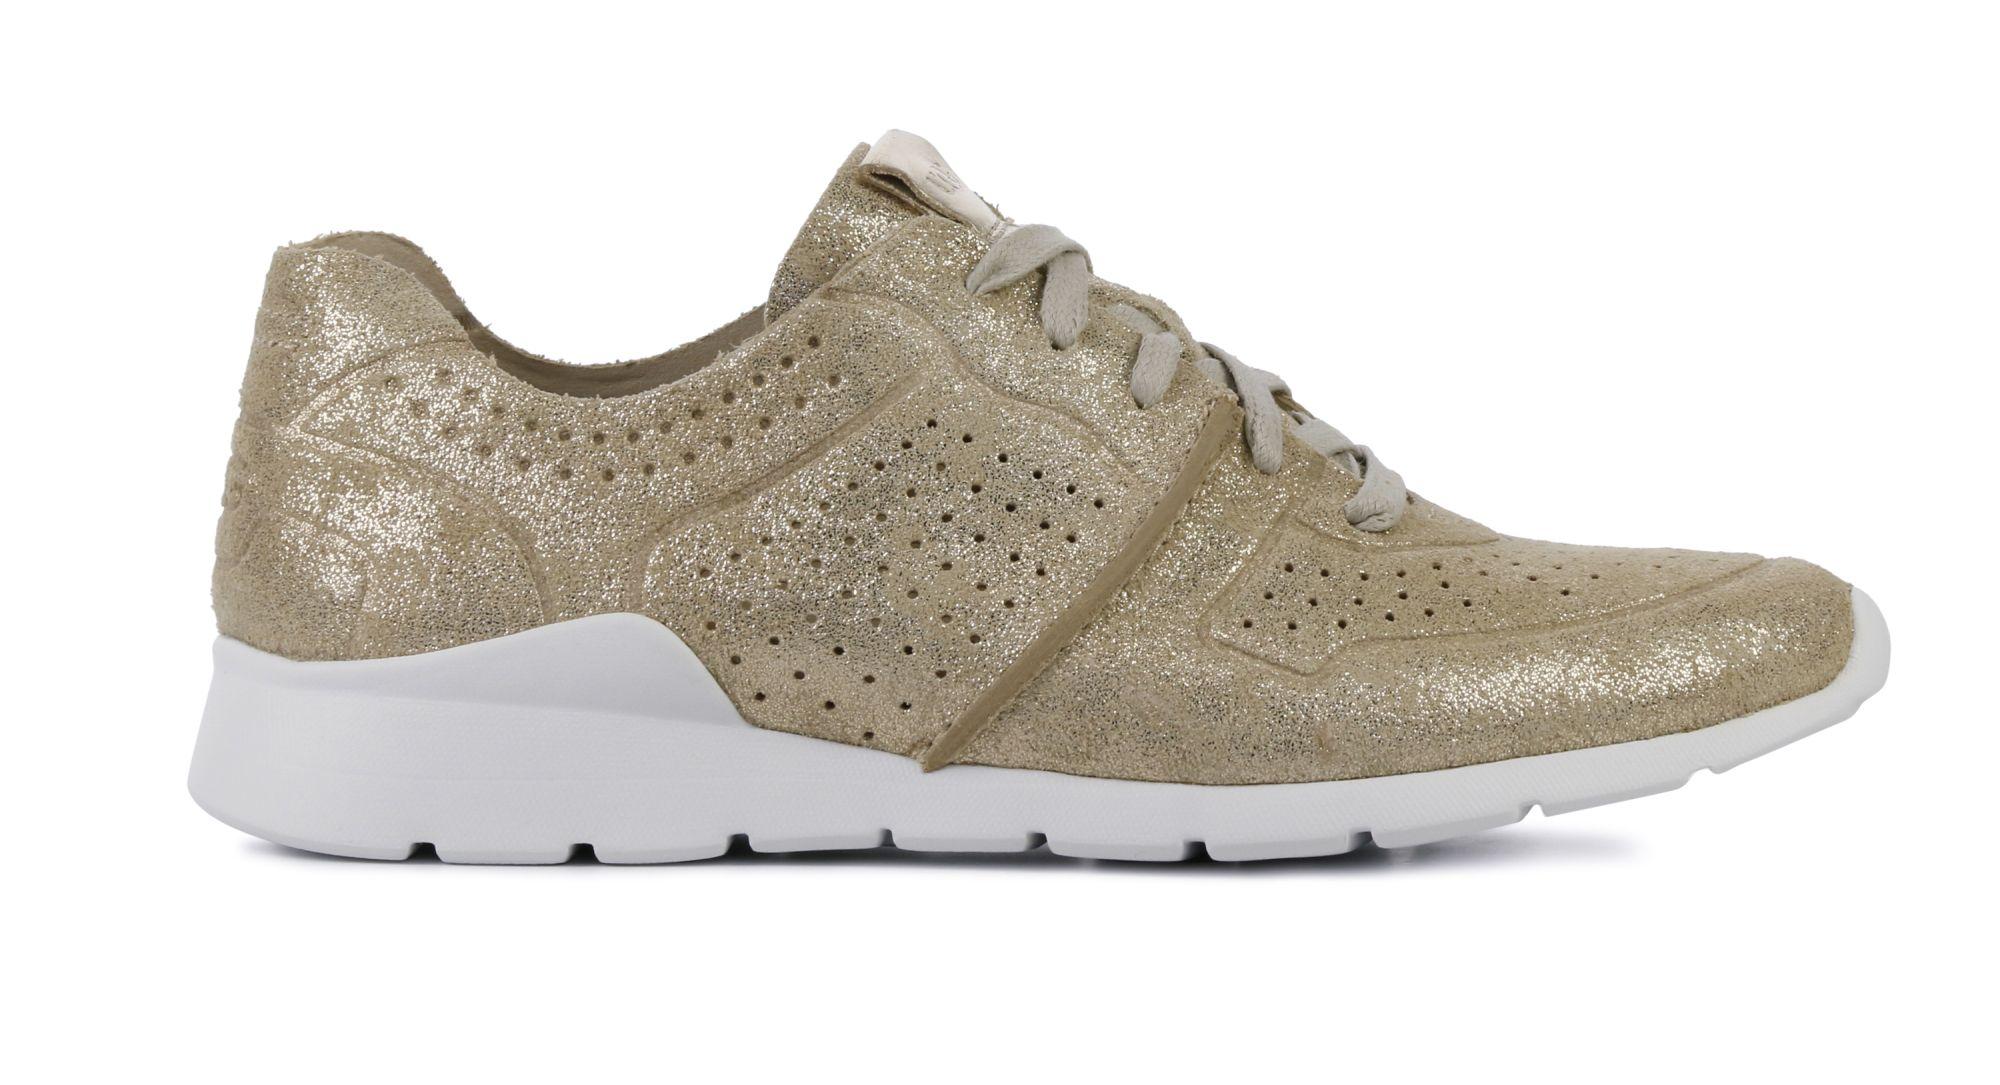 Sneakers Dames (Goud) Goedkope Koop Gratis Verzending Goedkoopste Prijs Hoe Veel Online Te Koop Em2uKbjxjP